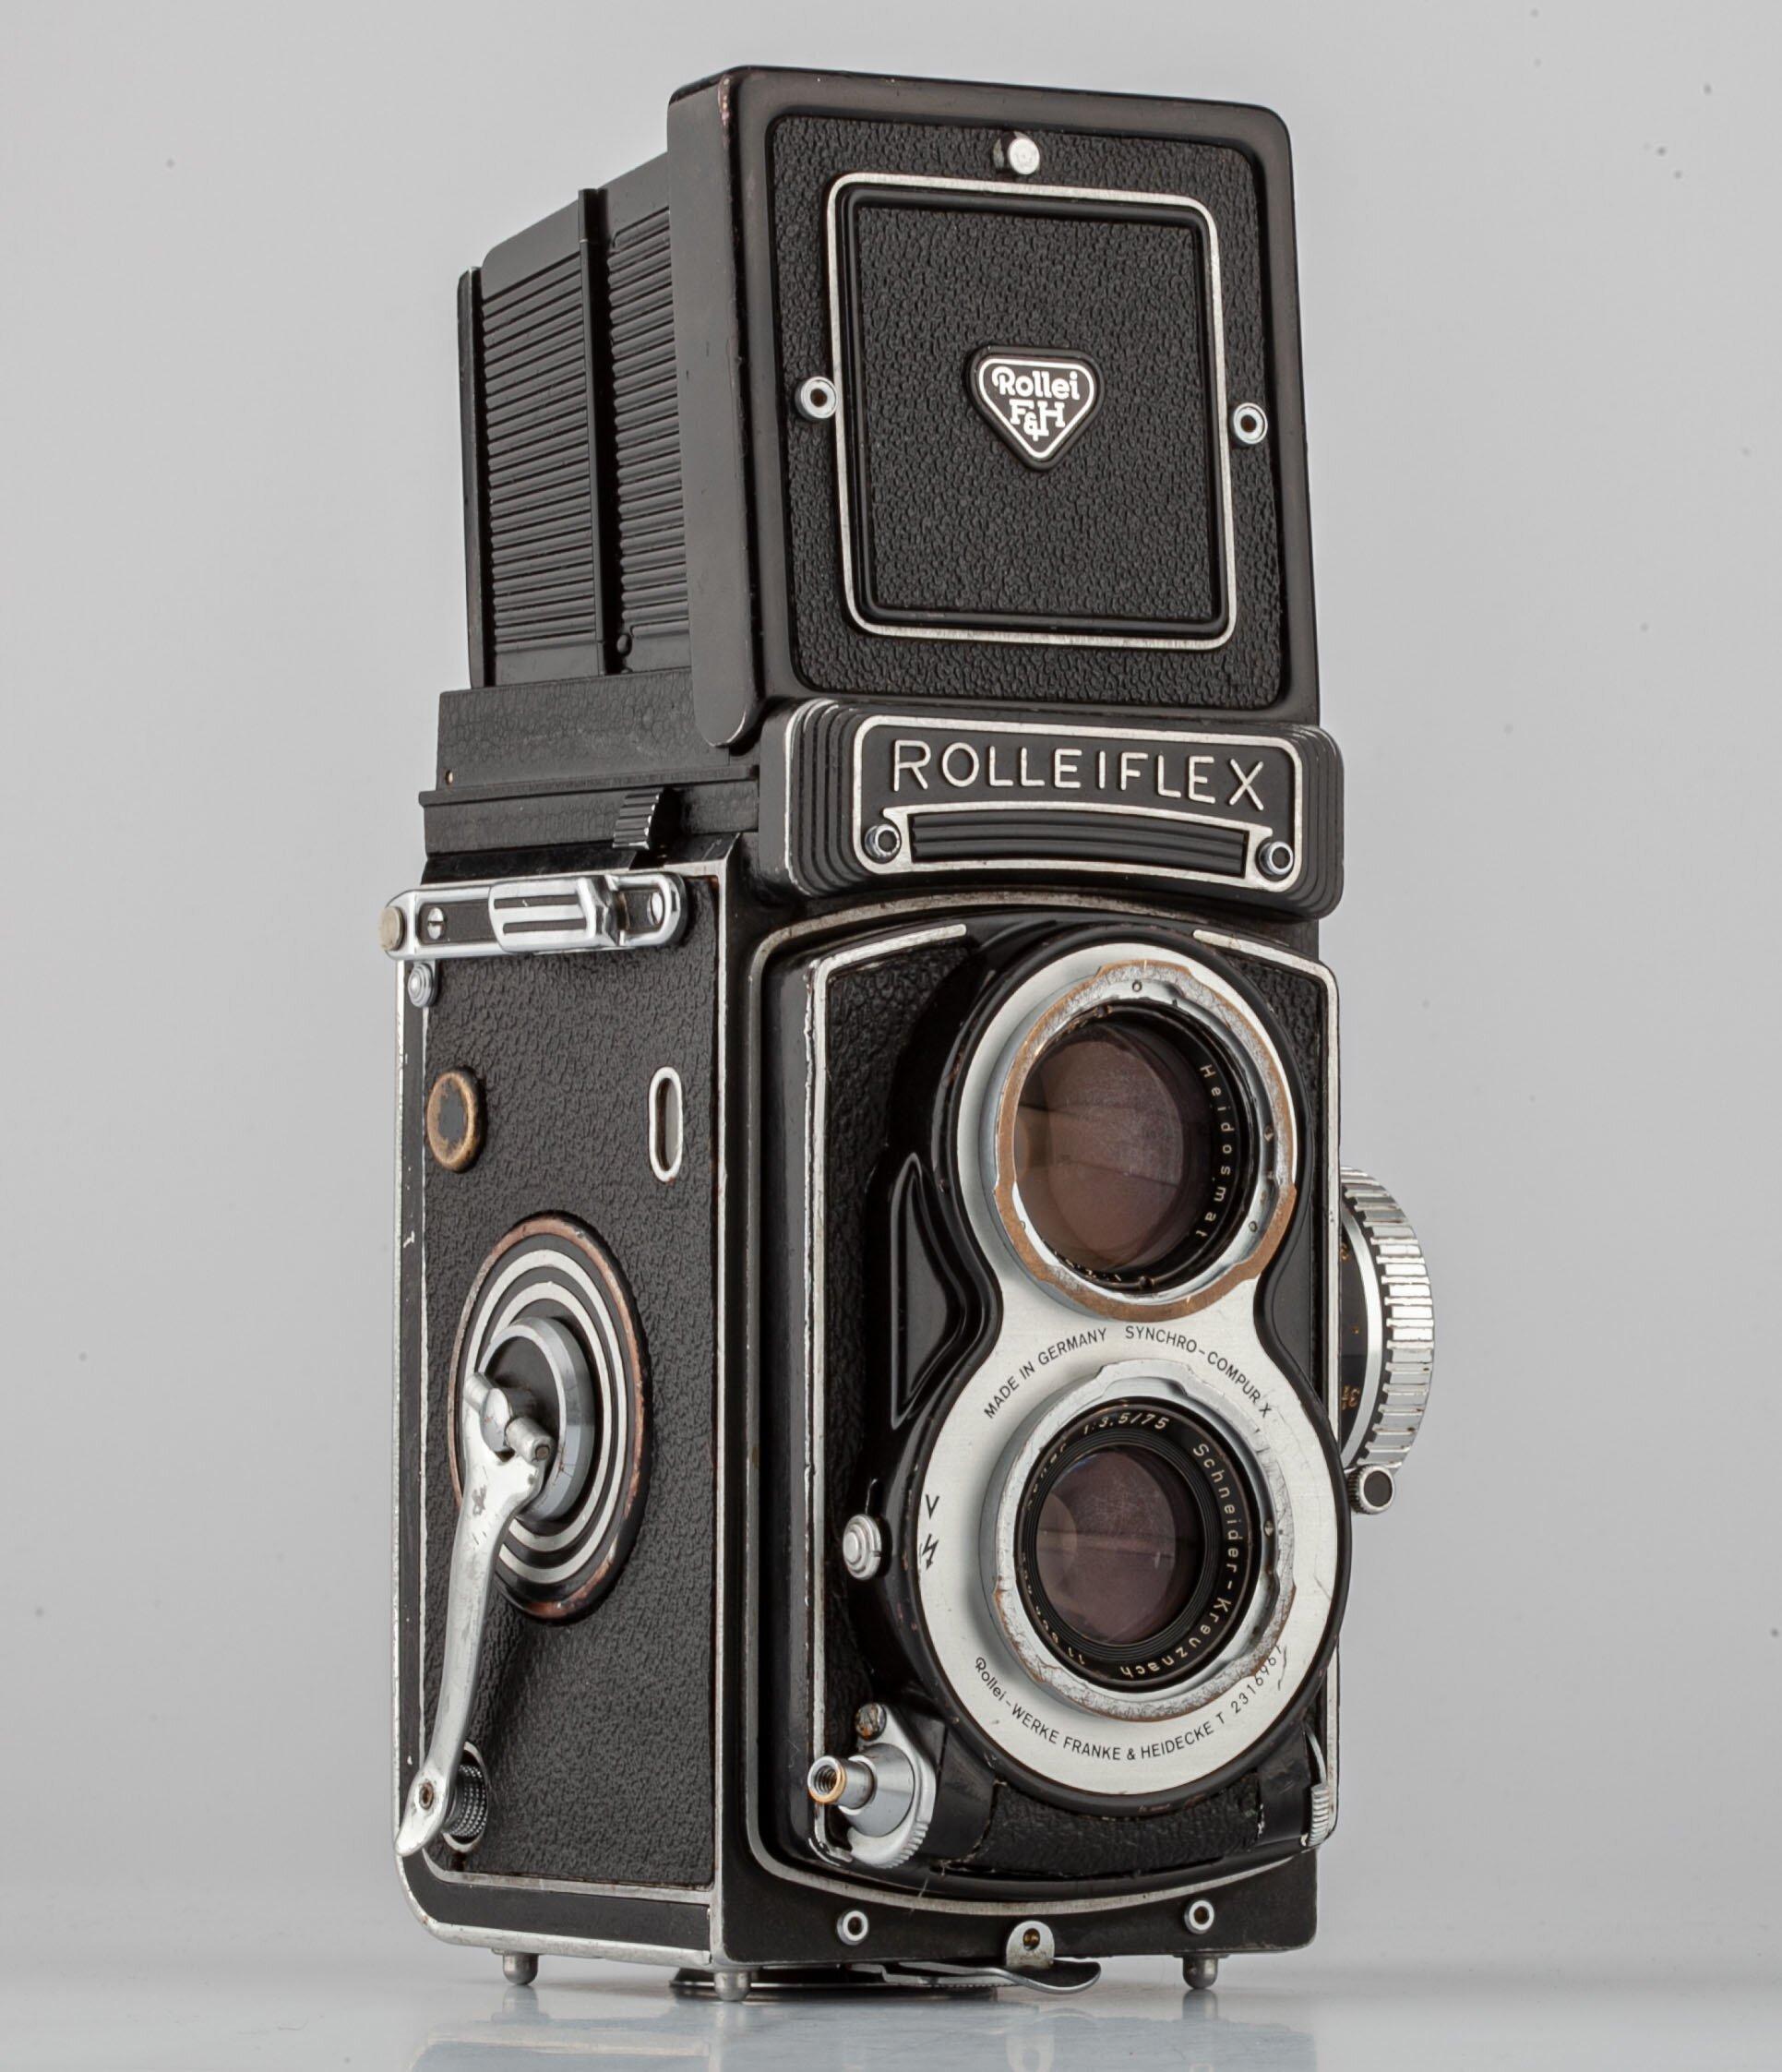 Rolleiflex T White Face 75mm F3.5